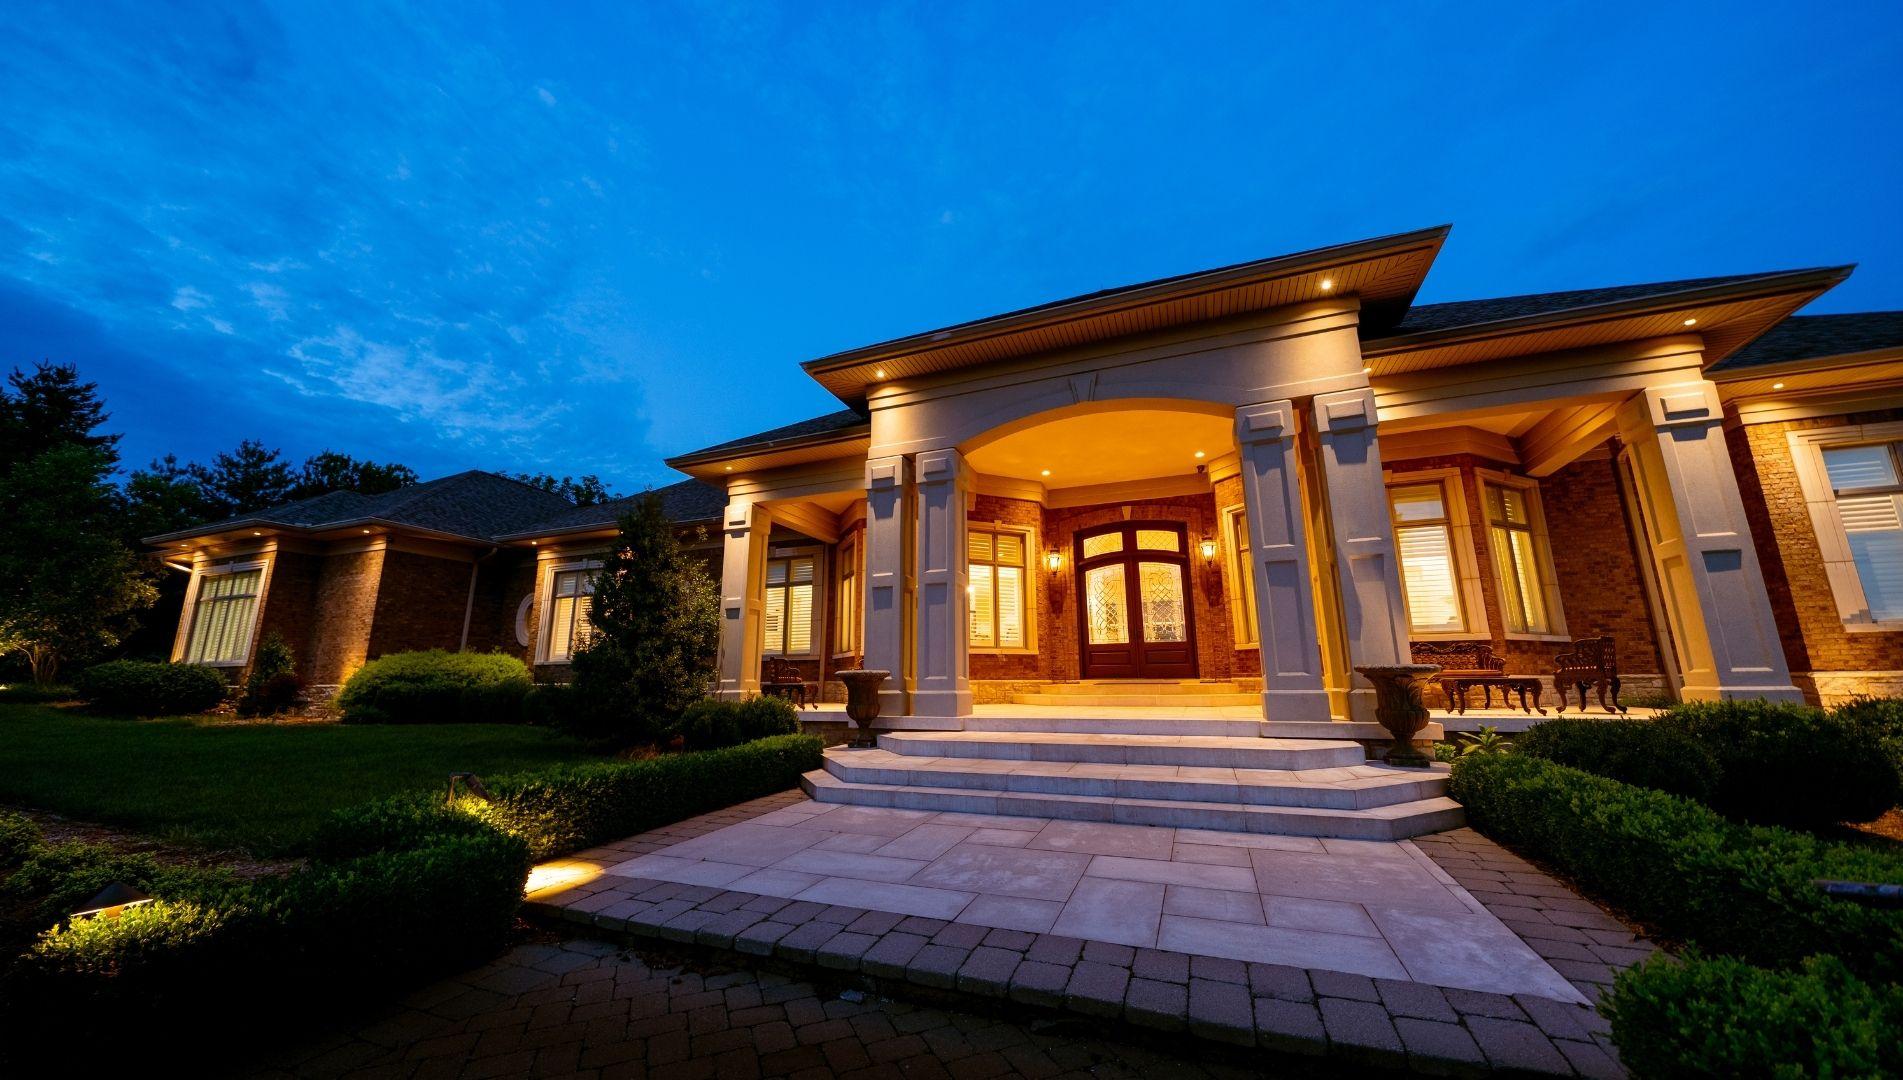 High Pointe Luxury Development House at Night